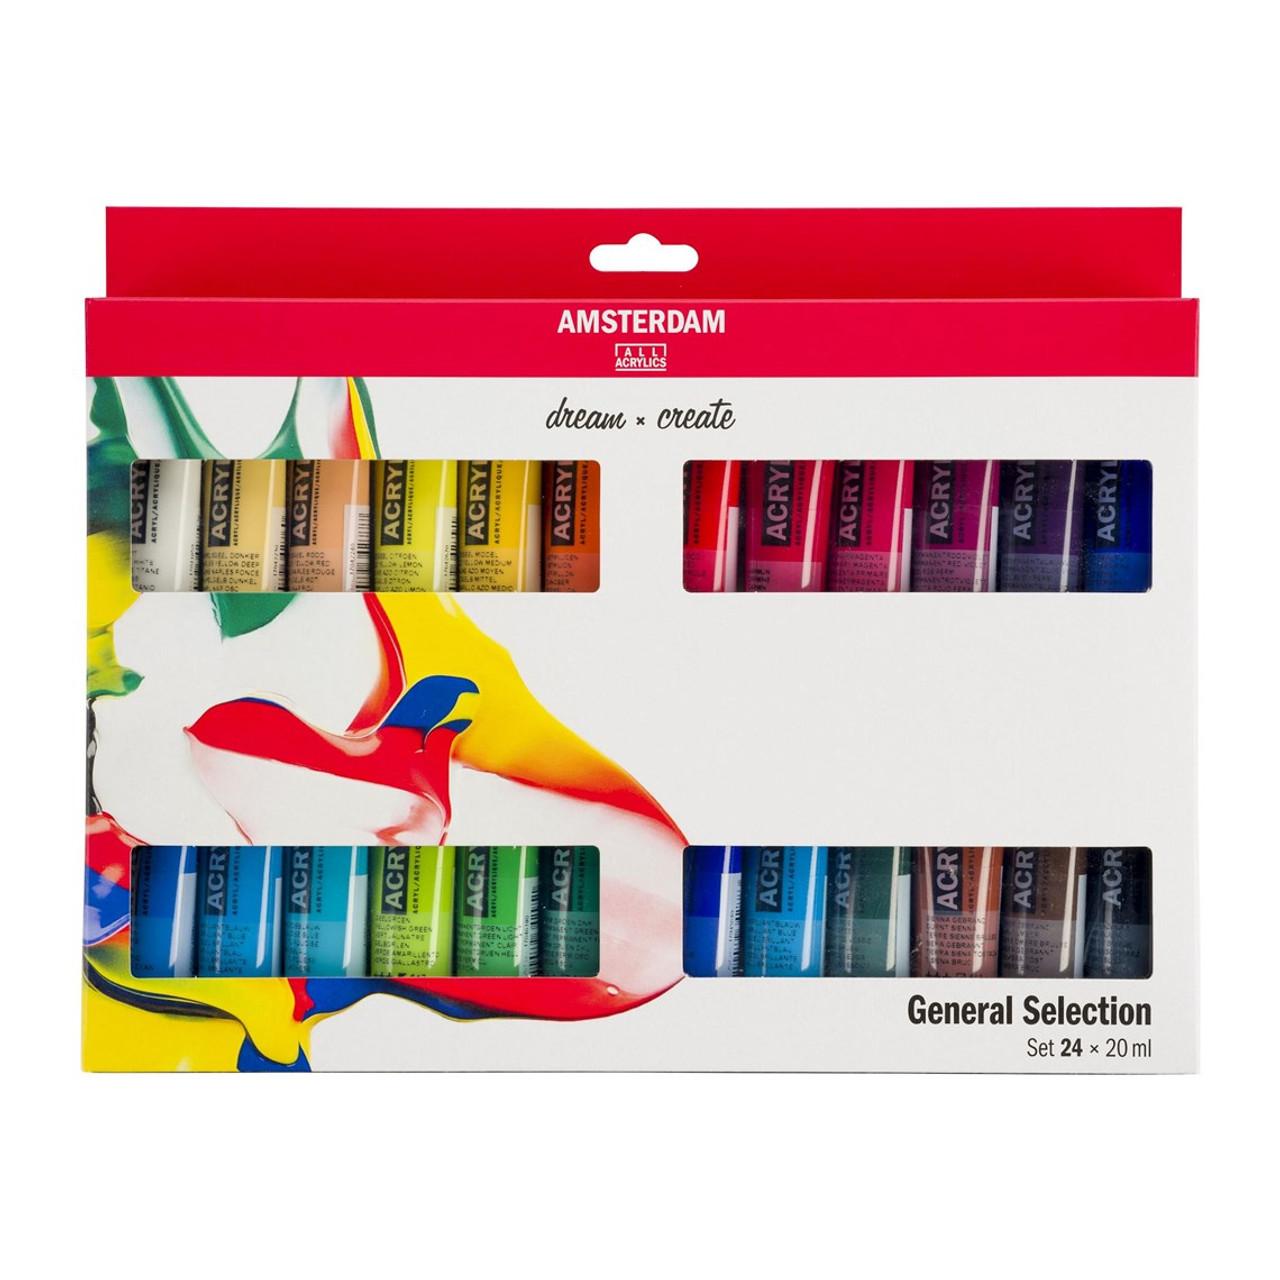 Amsterdam Standard Series Acrylic Paint 24-20ml Set